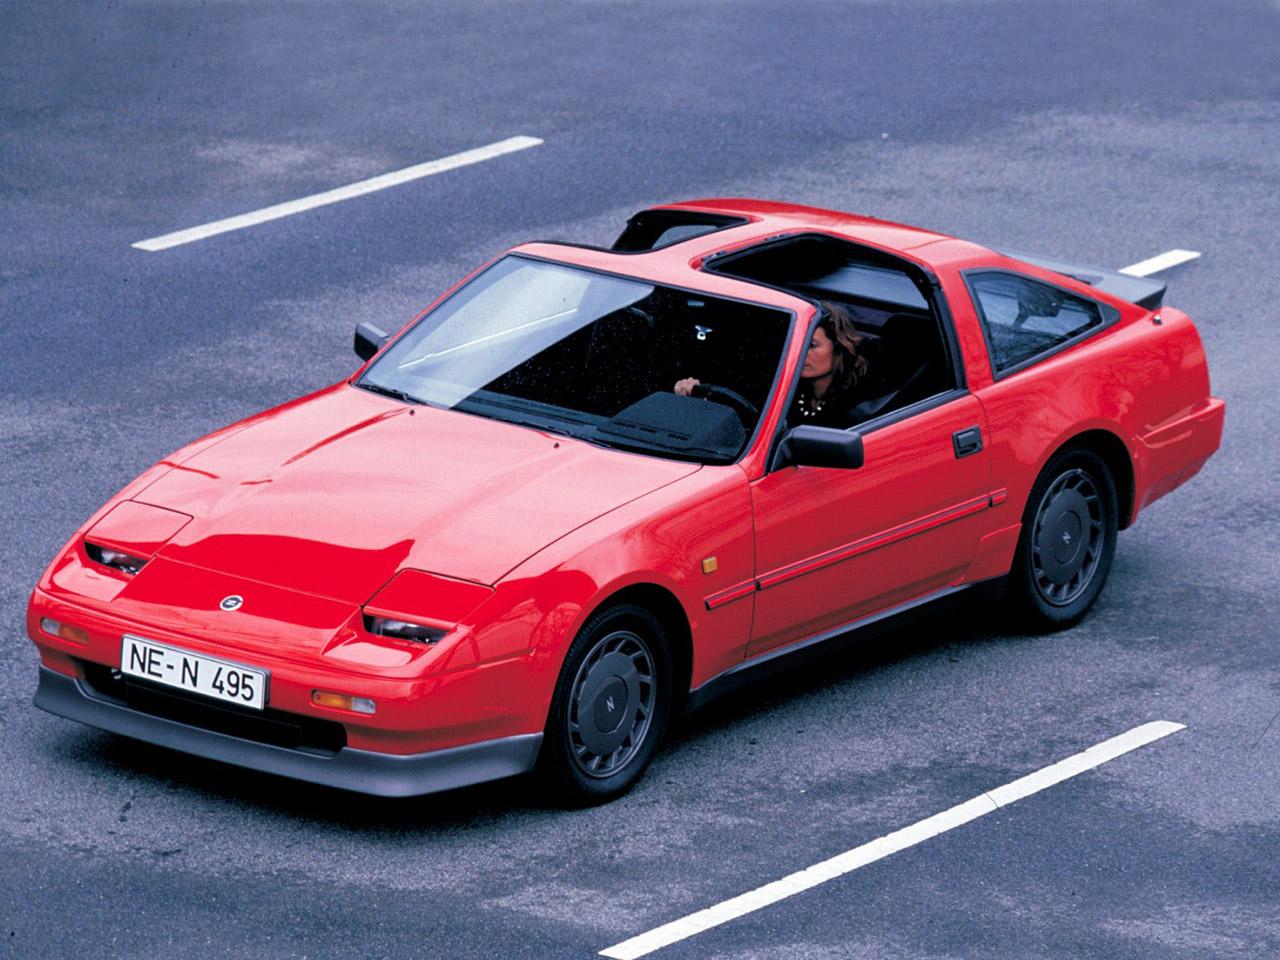 Nissan 300ZX I (Z31) 1983 - 1989 Coupe #5